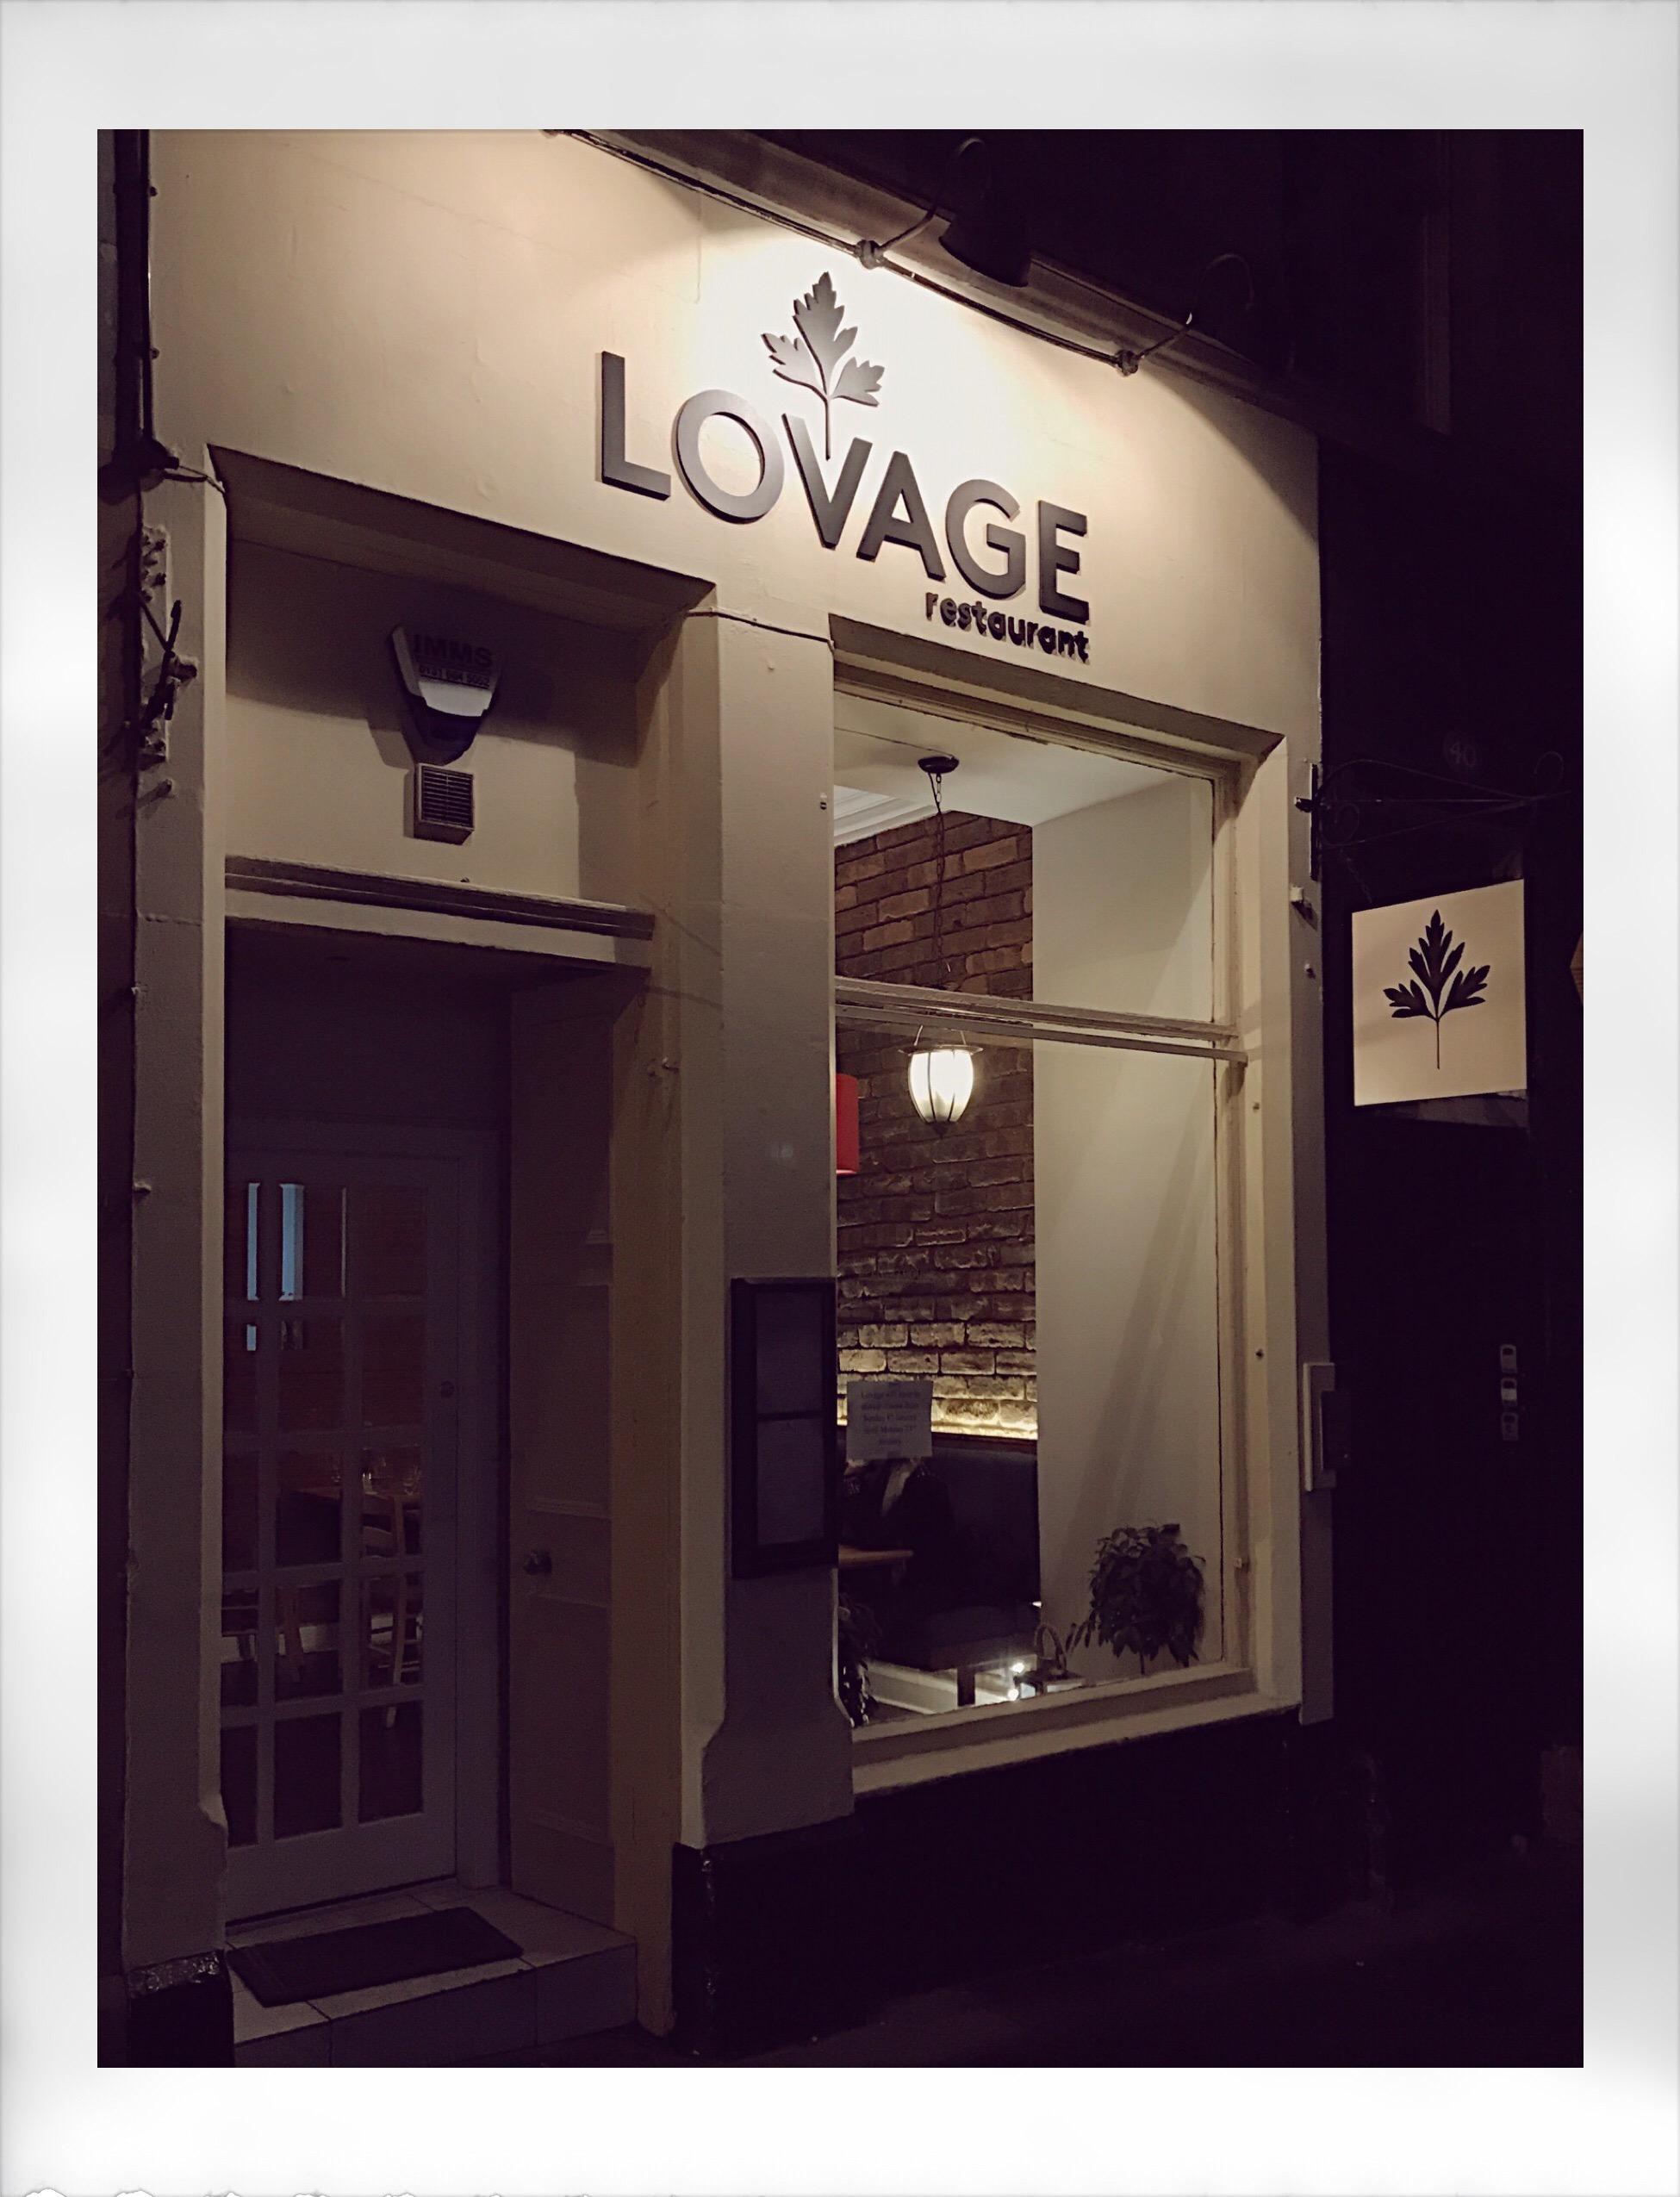 Lovage Restaurant Edinburgh exterior at night